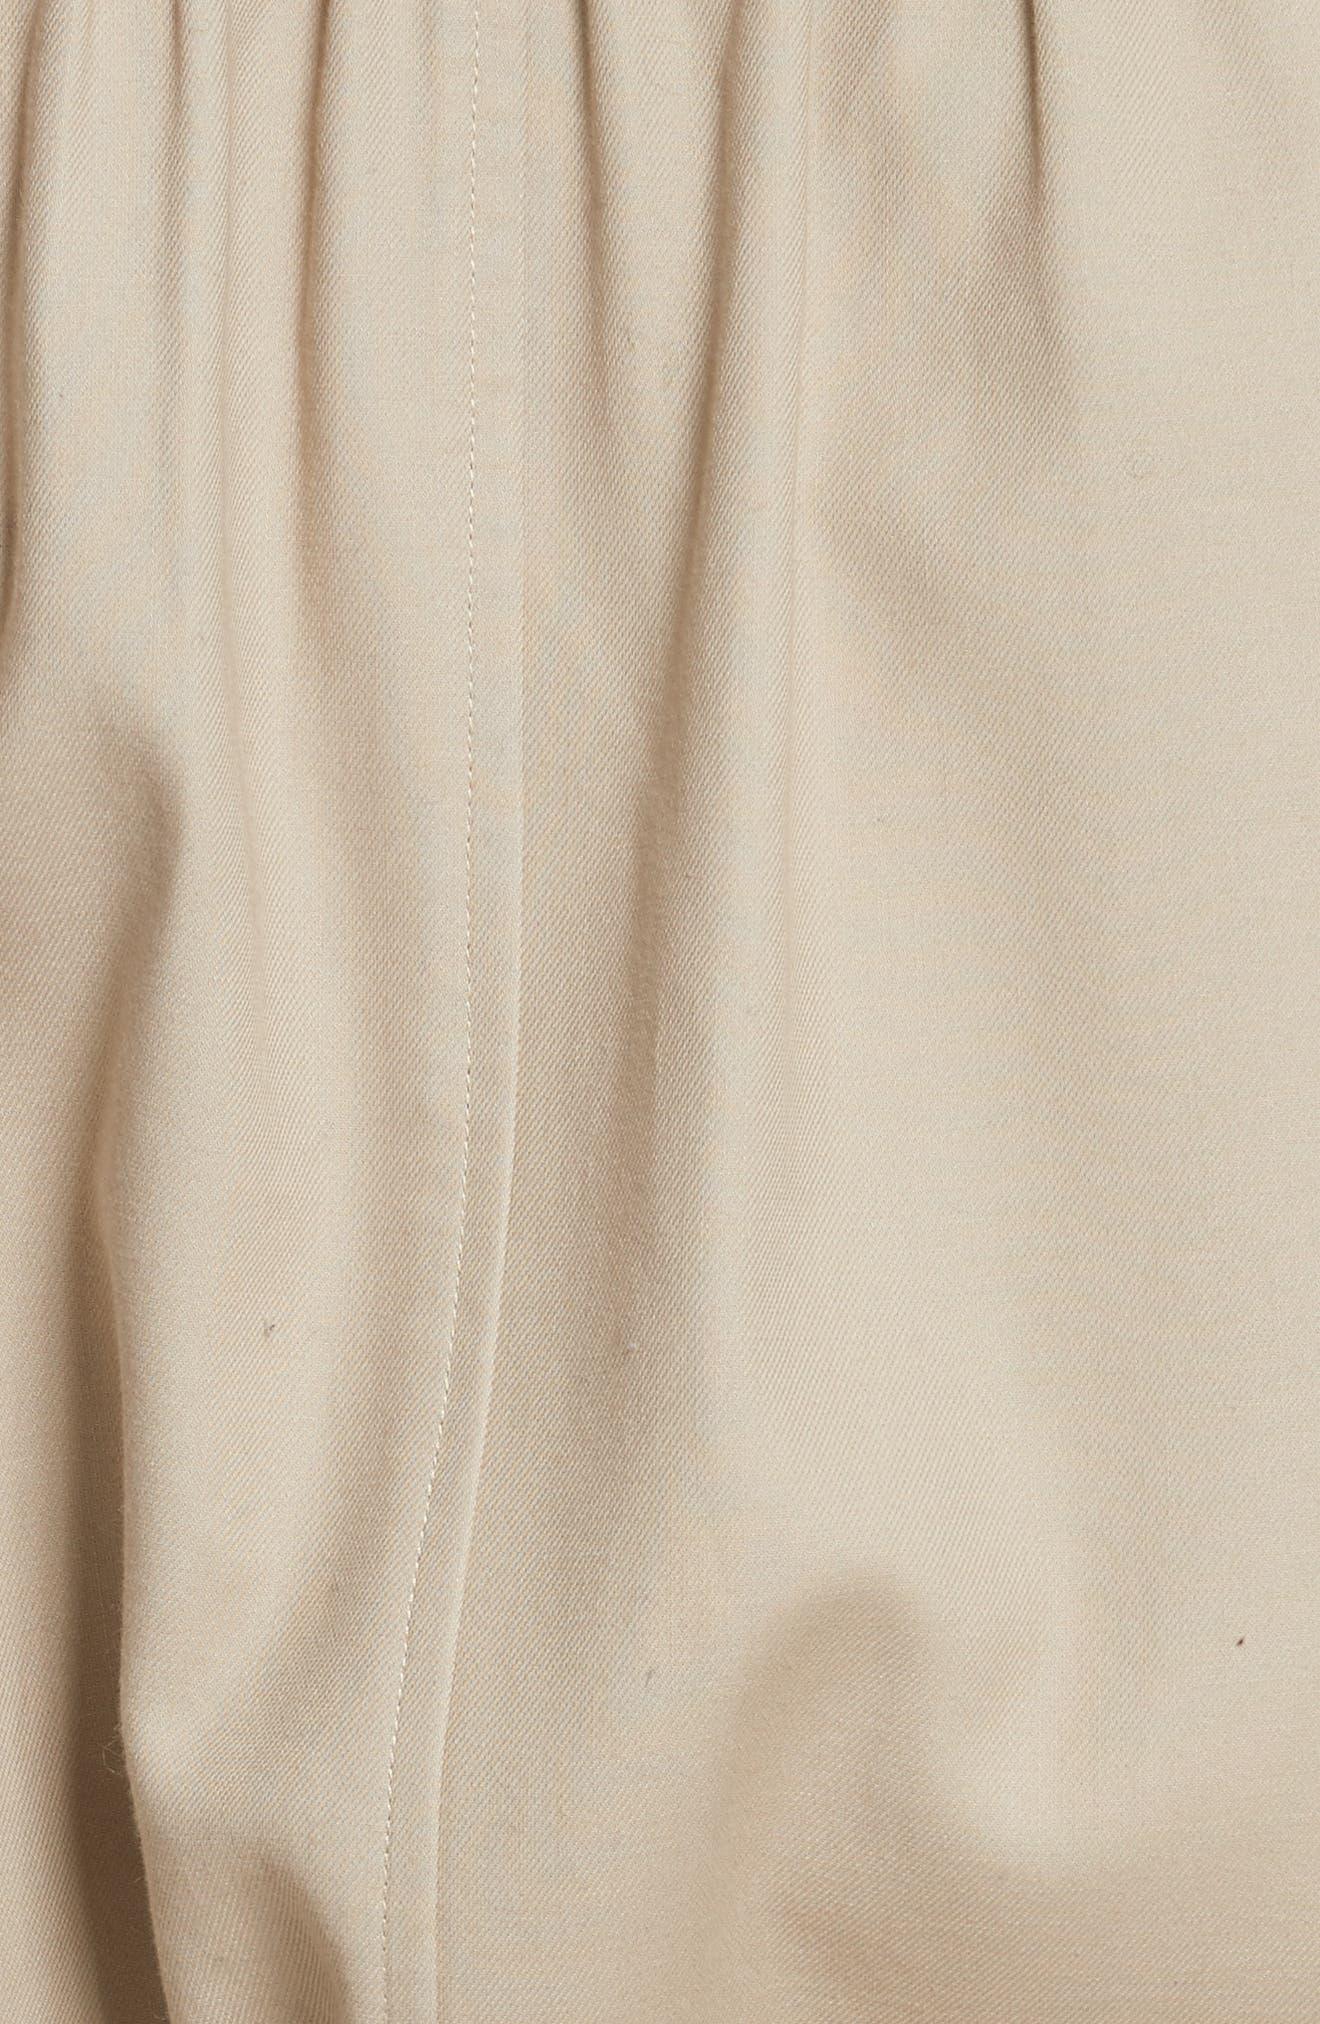 Alwena Cotton Trench Coat,                             Alternate thumbnail 6, color,                             250